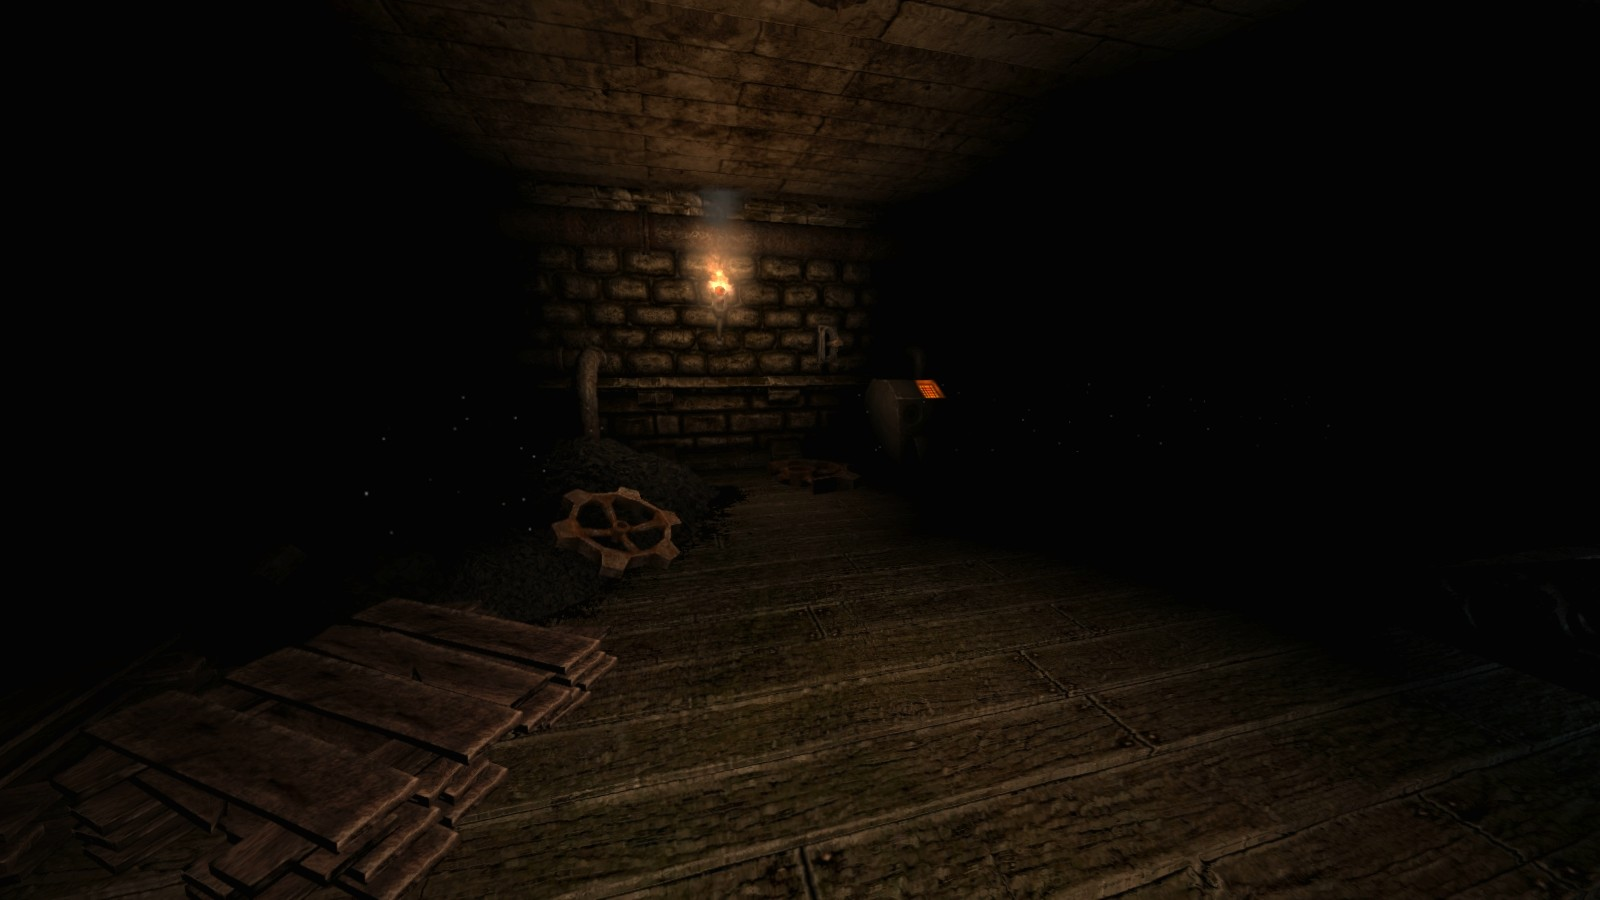 Amnesia: The Dark Descent - Rift: The Horror of 145